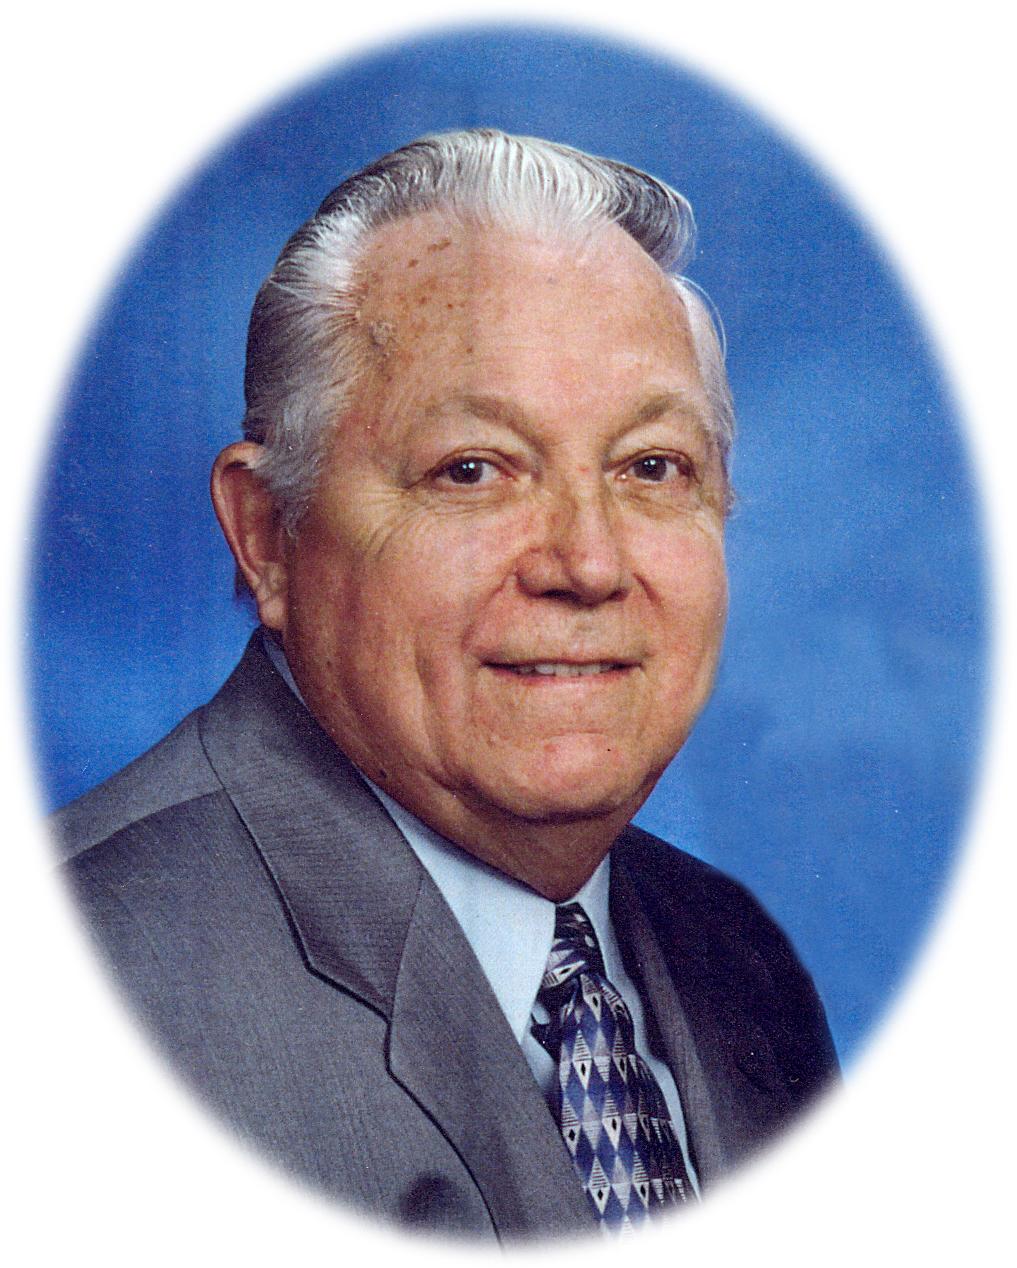 Robert J. Michelic